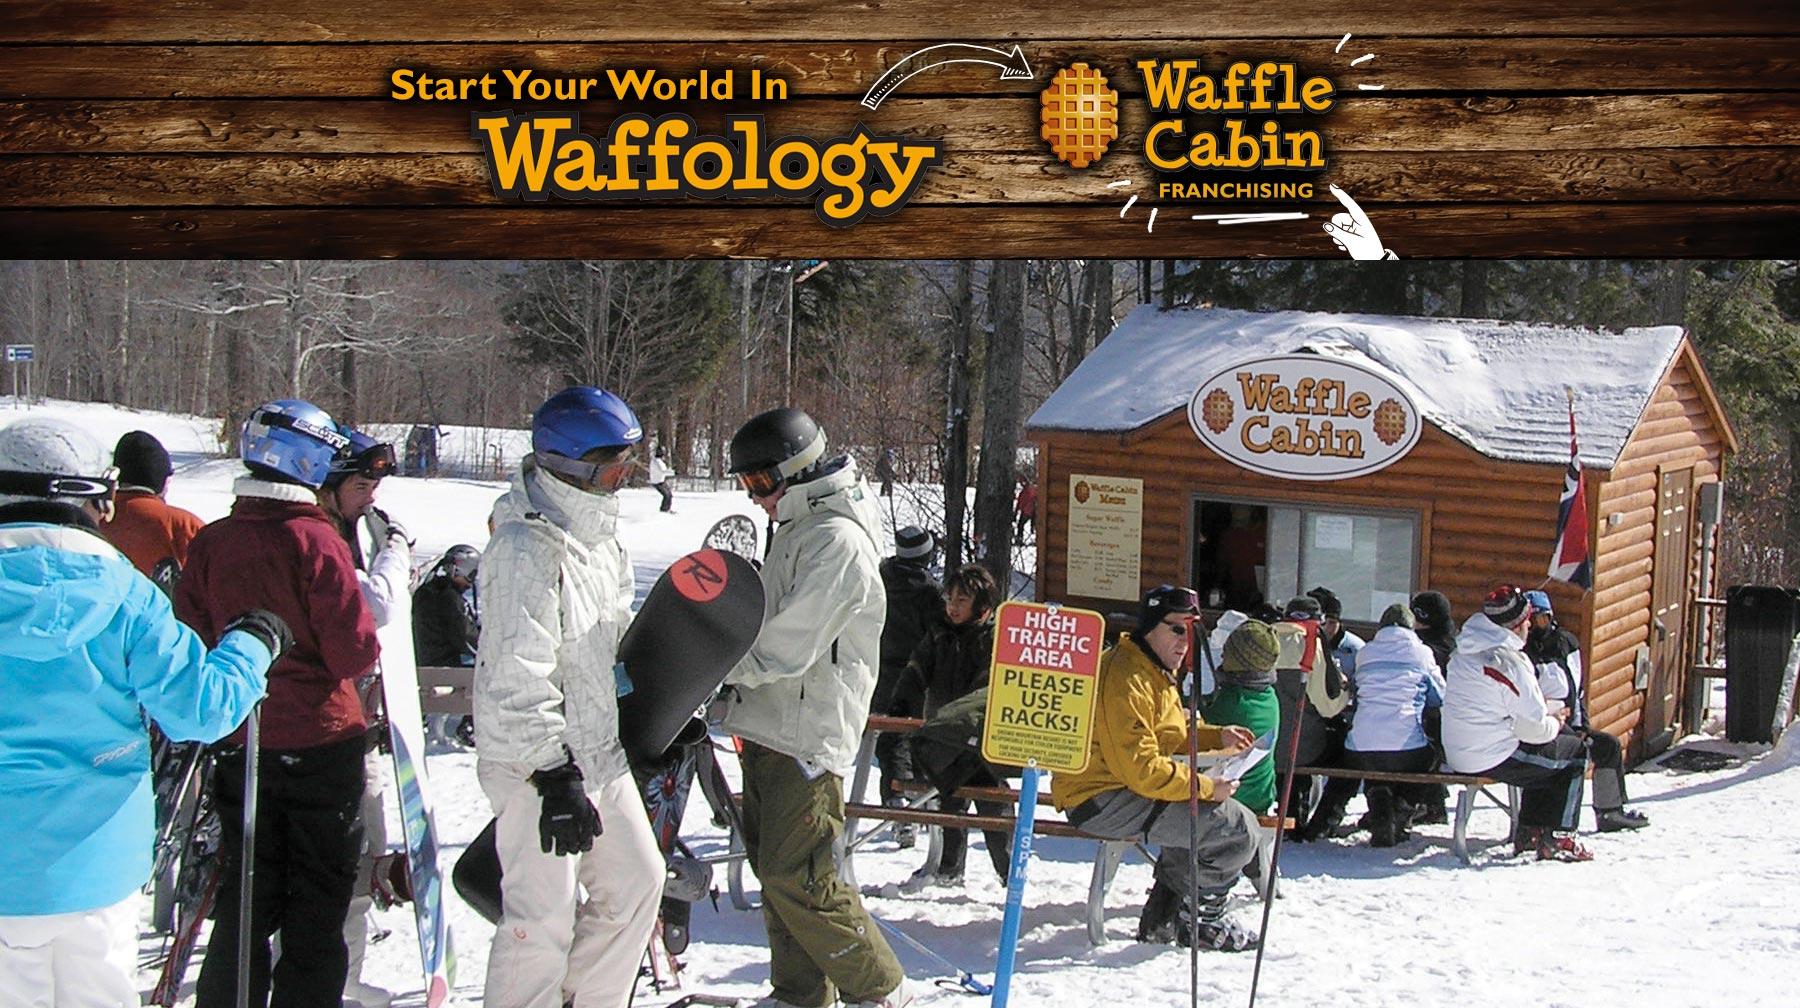 Waffle Cabin Franchising Vermont Belgium Waffles